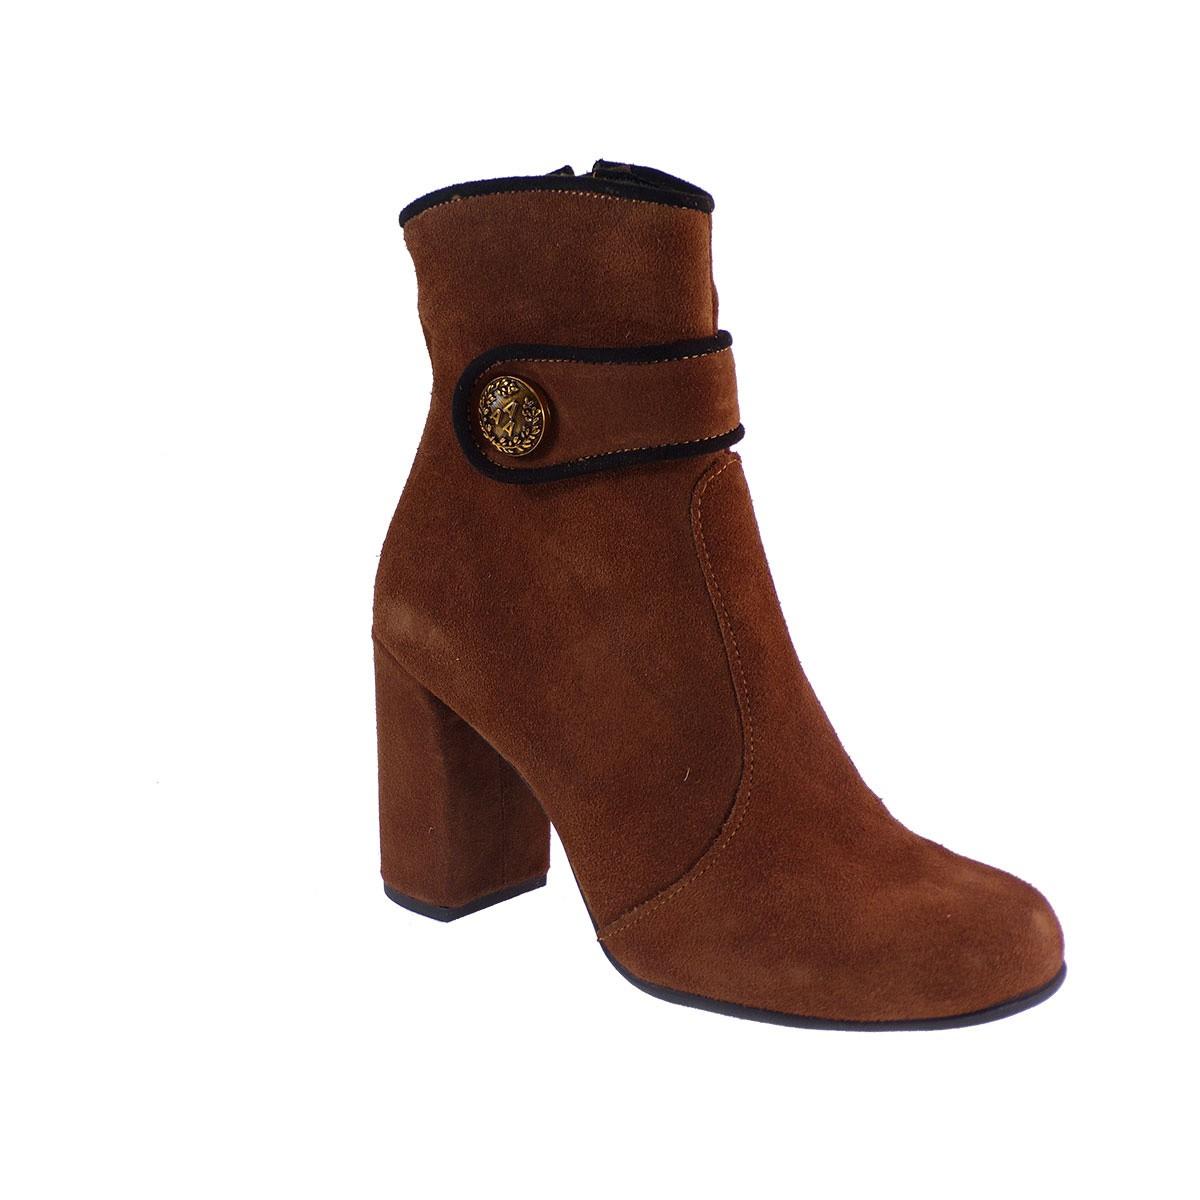 Smart Cronos Γυναικεία Παπούτσια Μποτάκια 7145-3738 Ταμπά Δέρμα Καστόρι